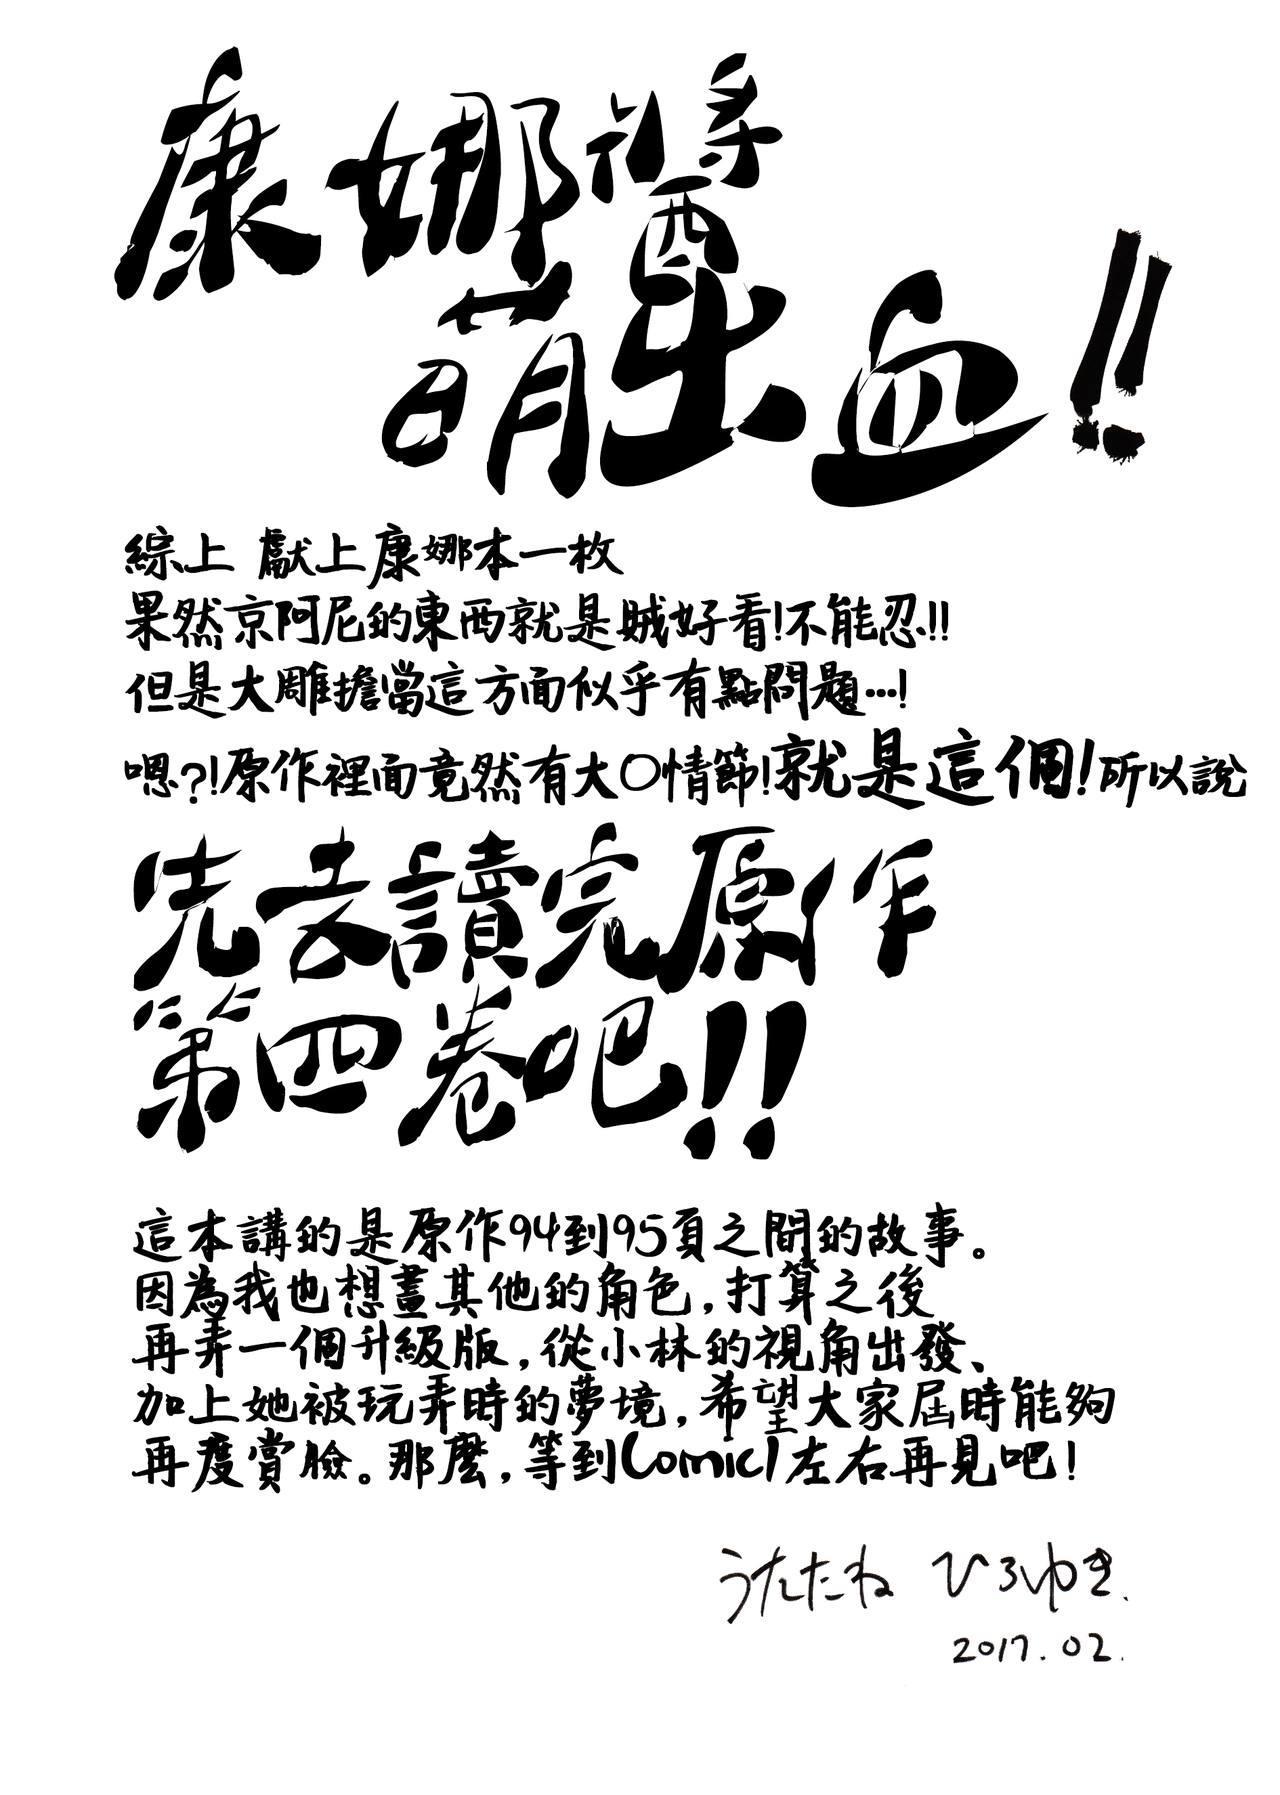 (SC2017 Winter) [UROBOROS (Utatane Hiroyuki)] Futomomo Hime (Kobayashi-san-chi no Maid Dragon) [Chinese] [朔夜x oo君漢化] 2